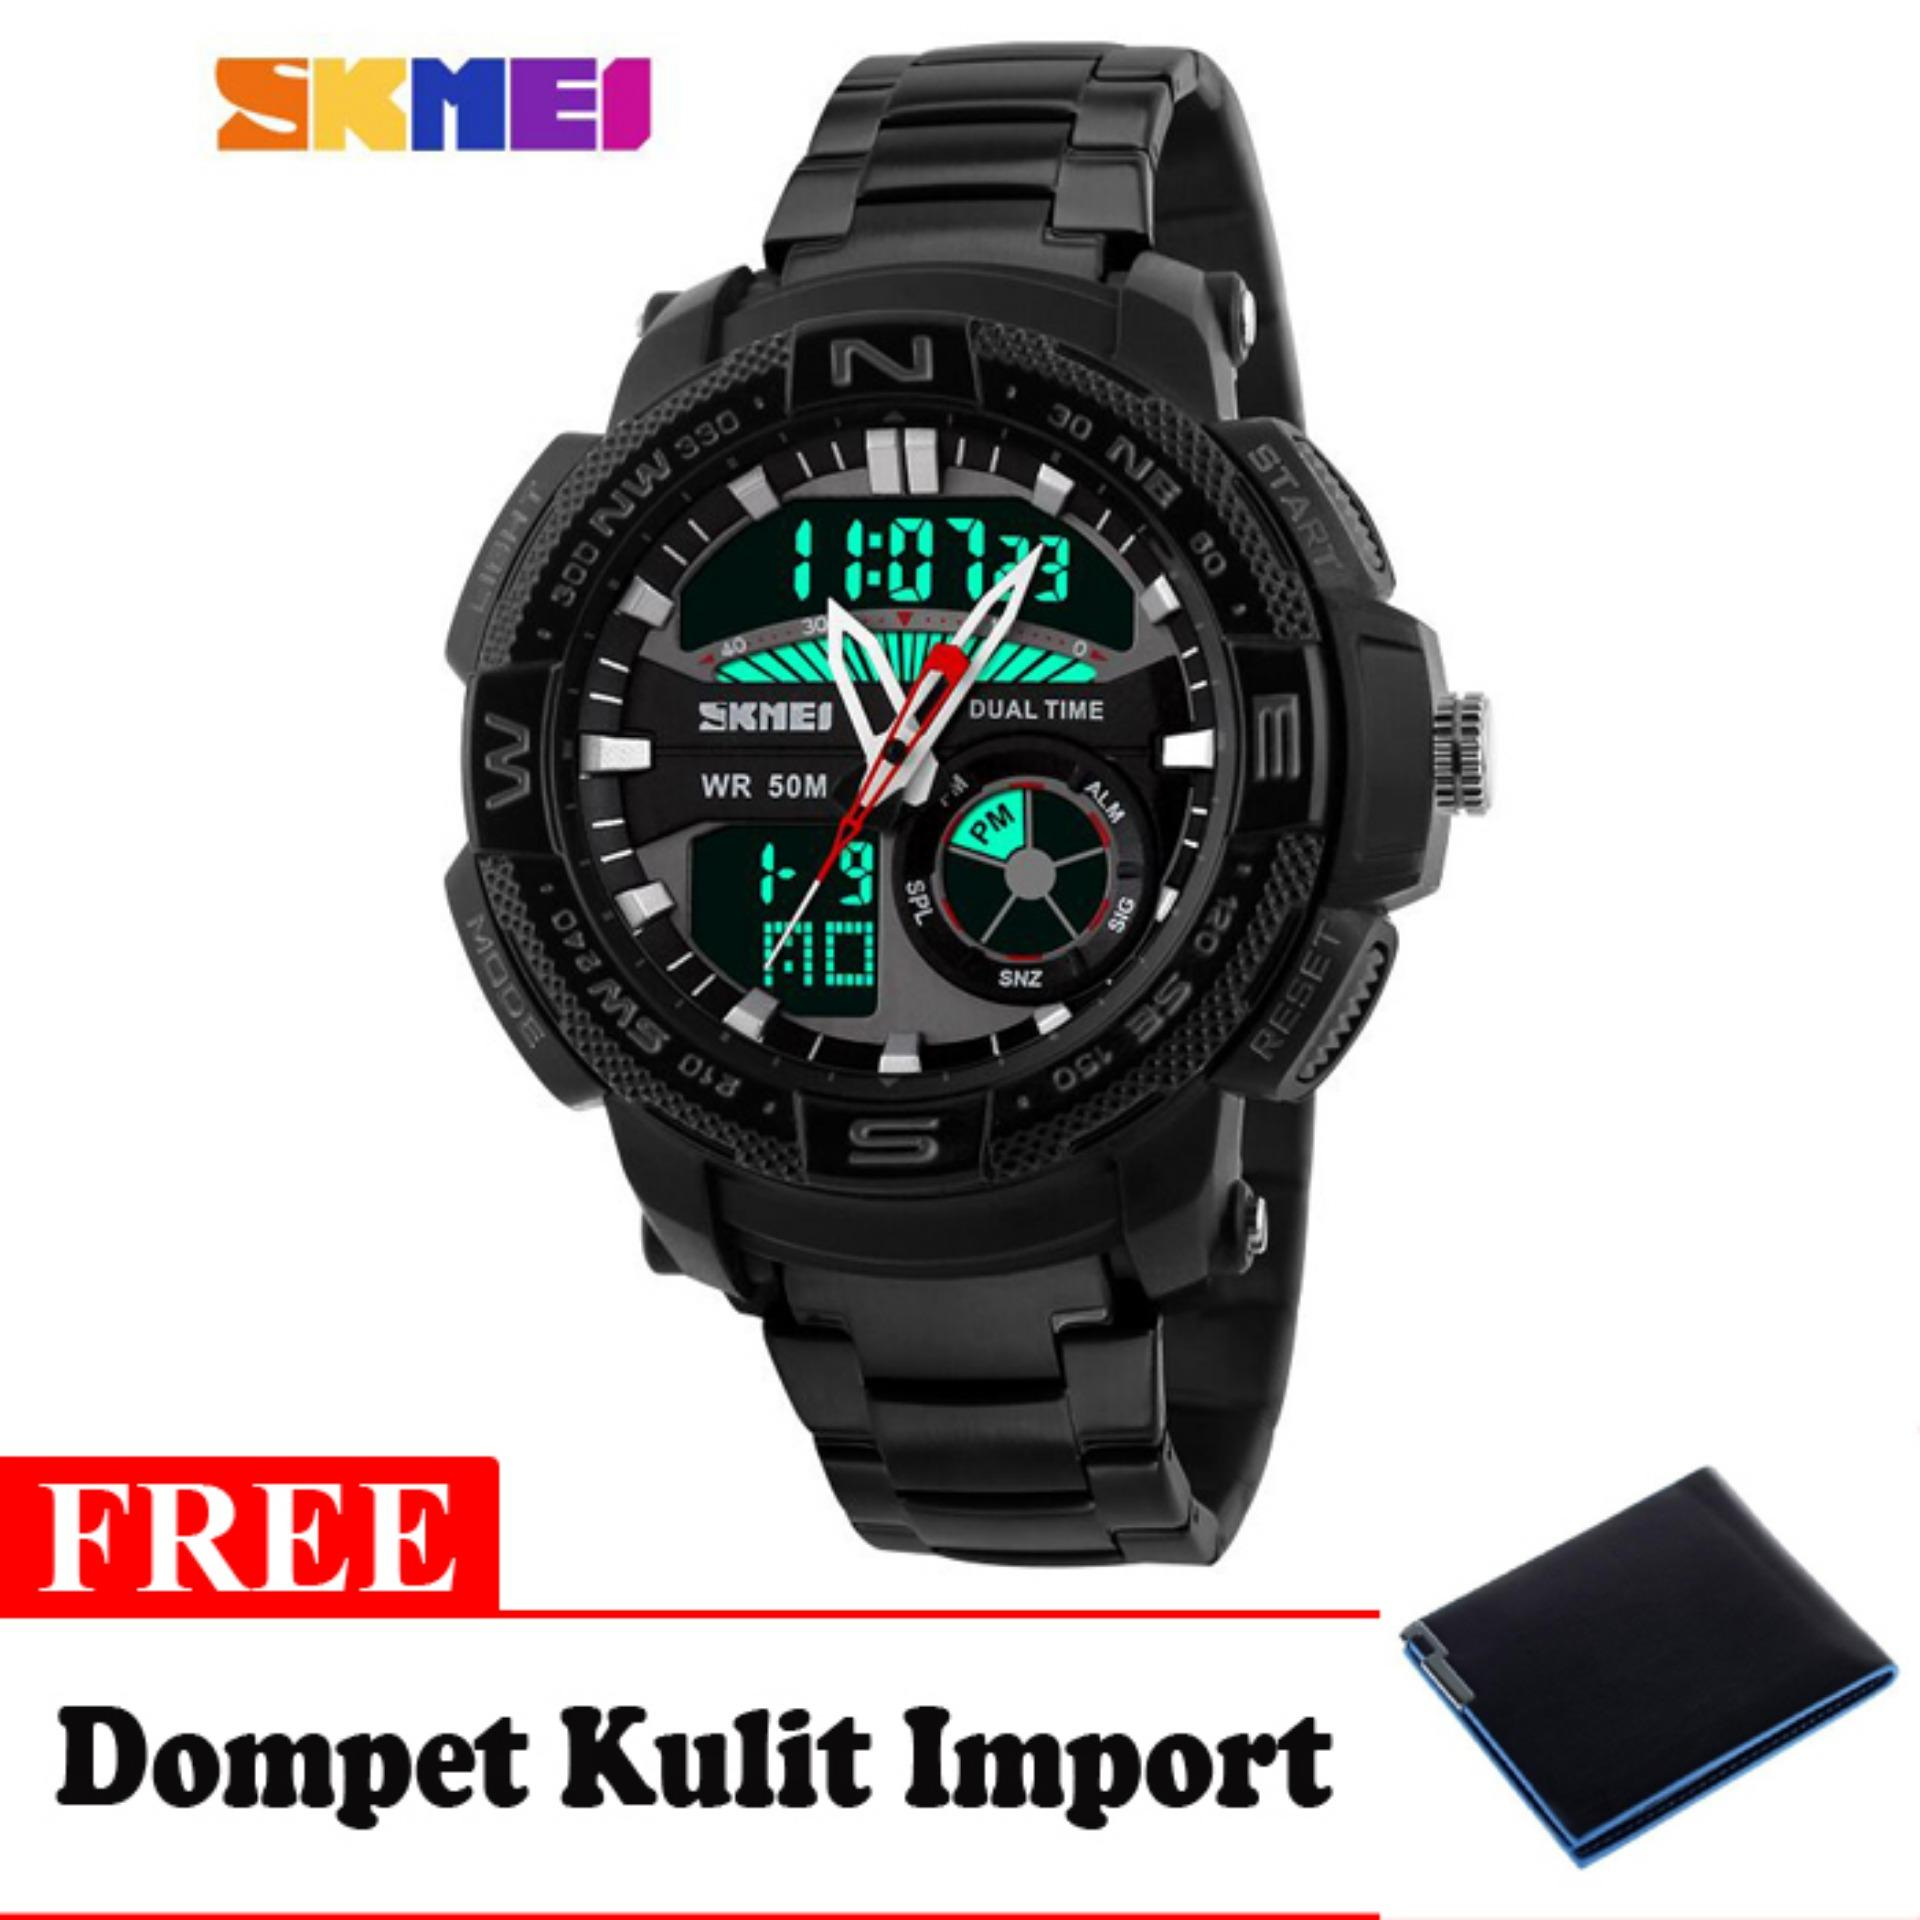 SKMEI Goliath Hitam - Jam Tangan Pria - Rantai Stainless Steel - 1121 Dual Time Black + Free Dompet Kulit Import